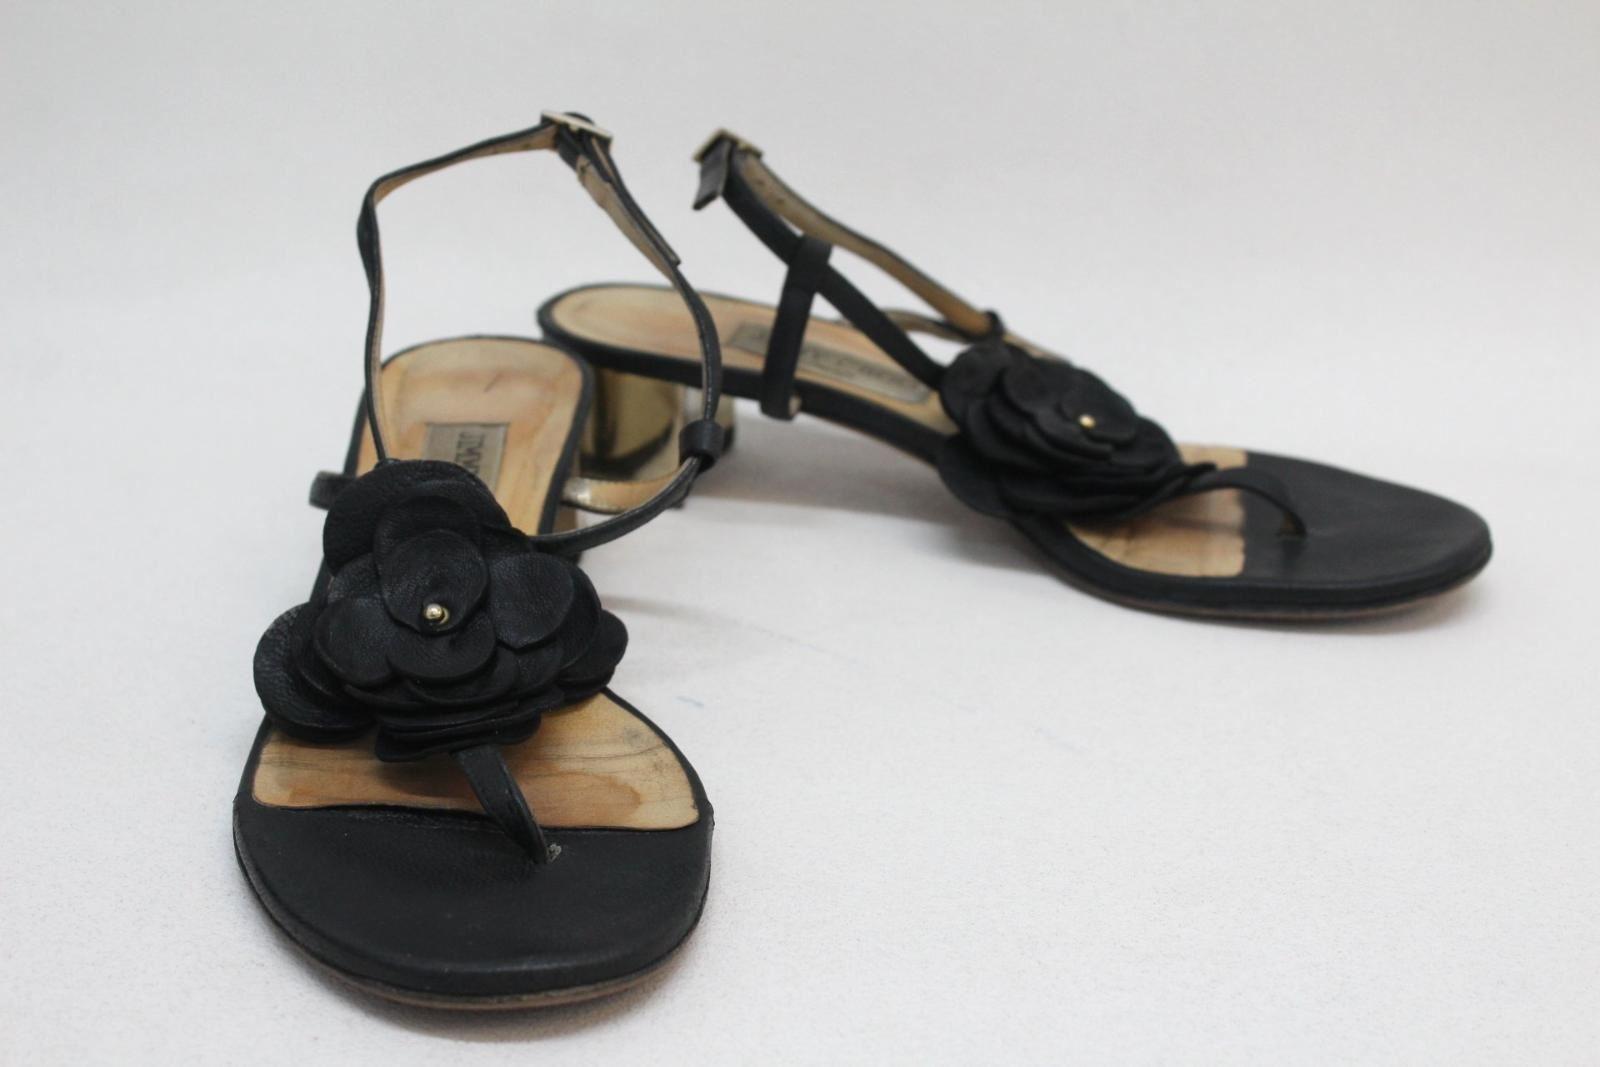 JIMMY CHOO Ladies Black Leather Floral T-Bar Sandal shoes Size UK5.5 EU38.5